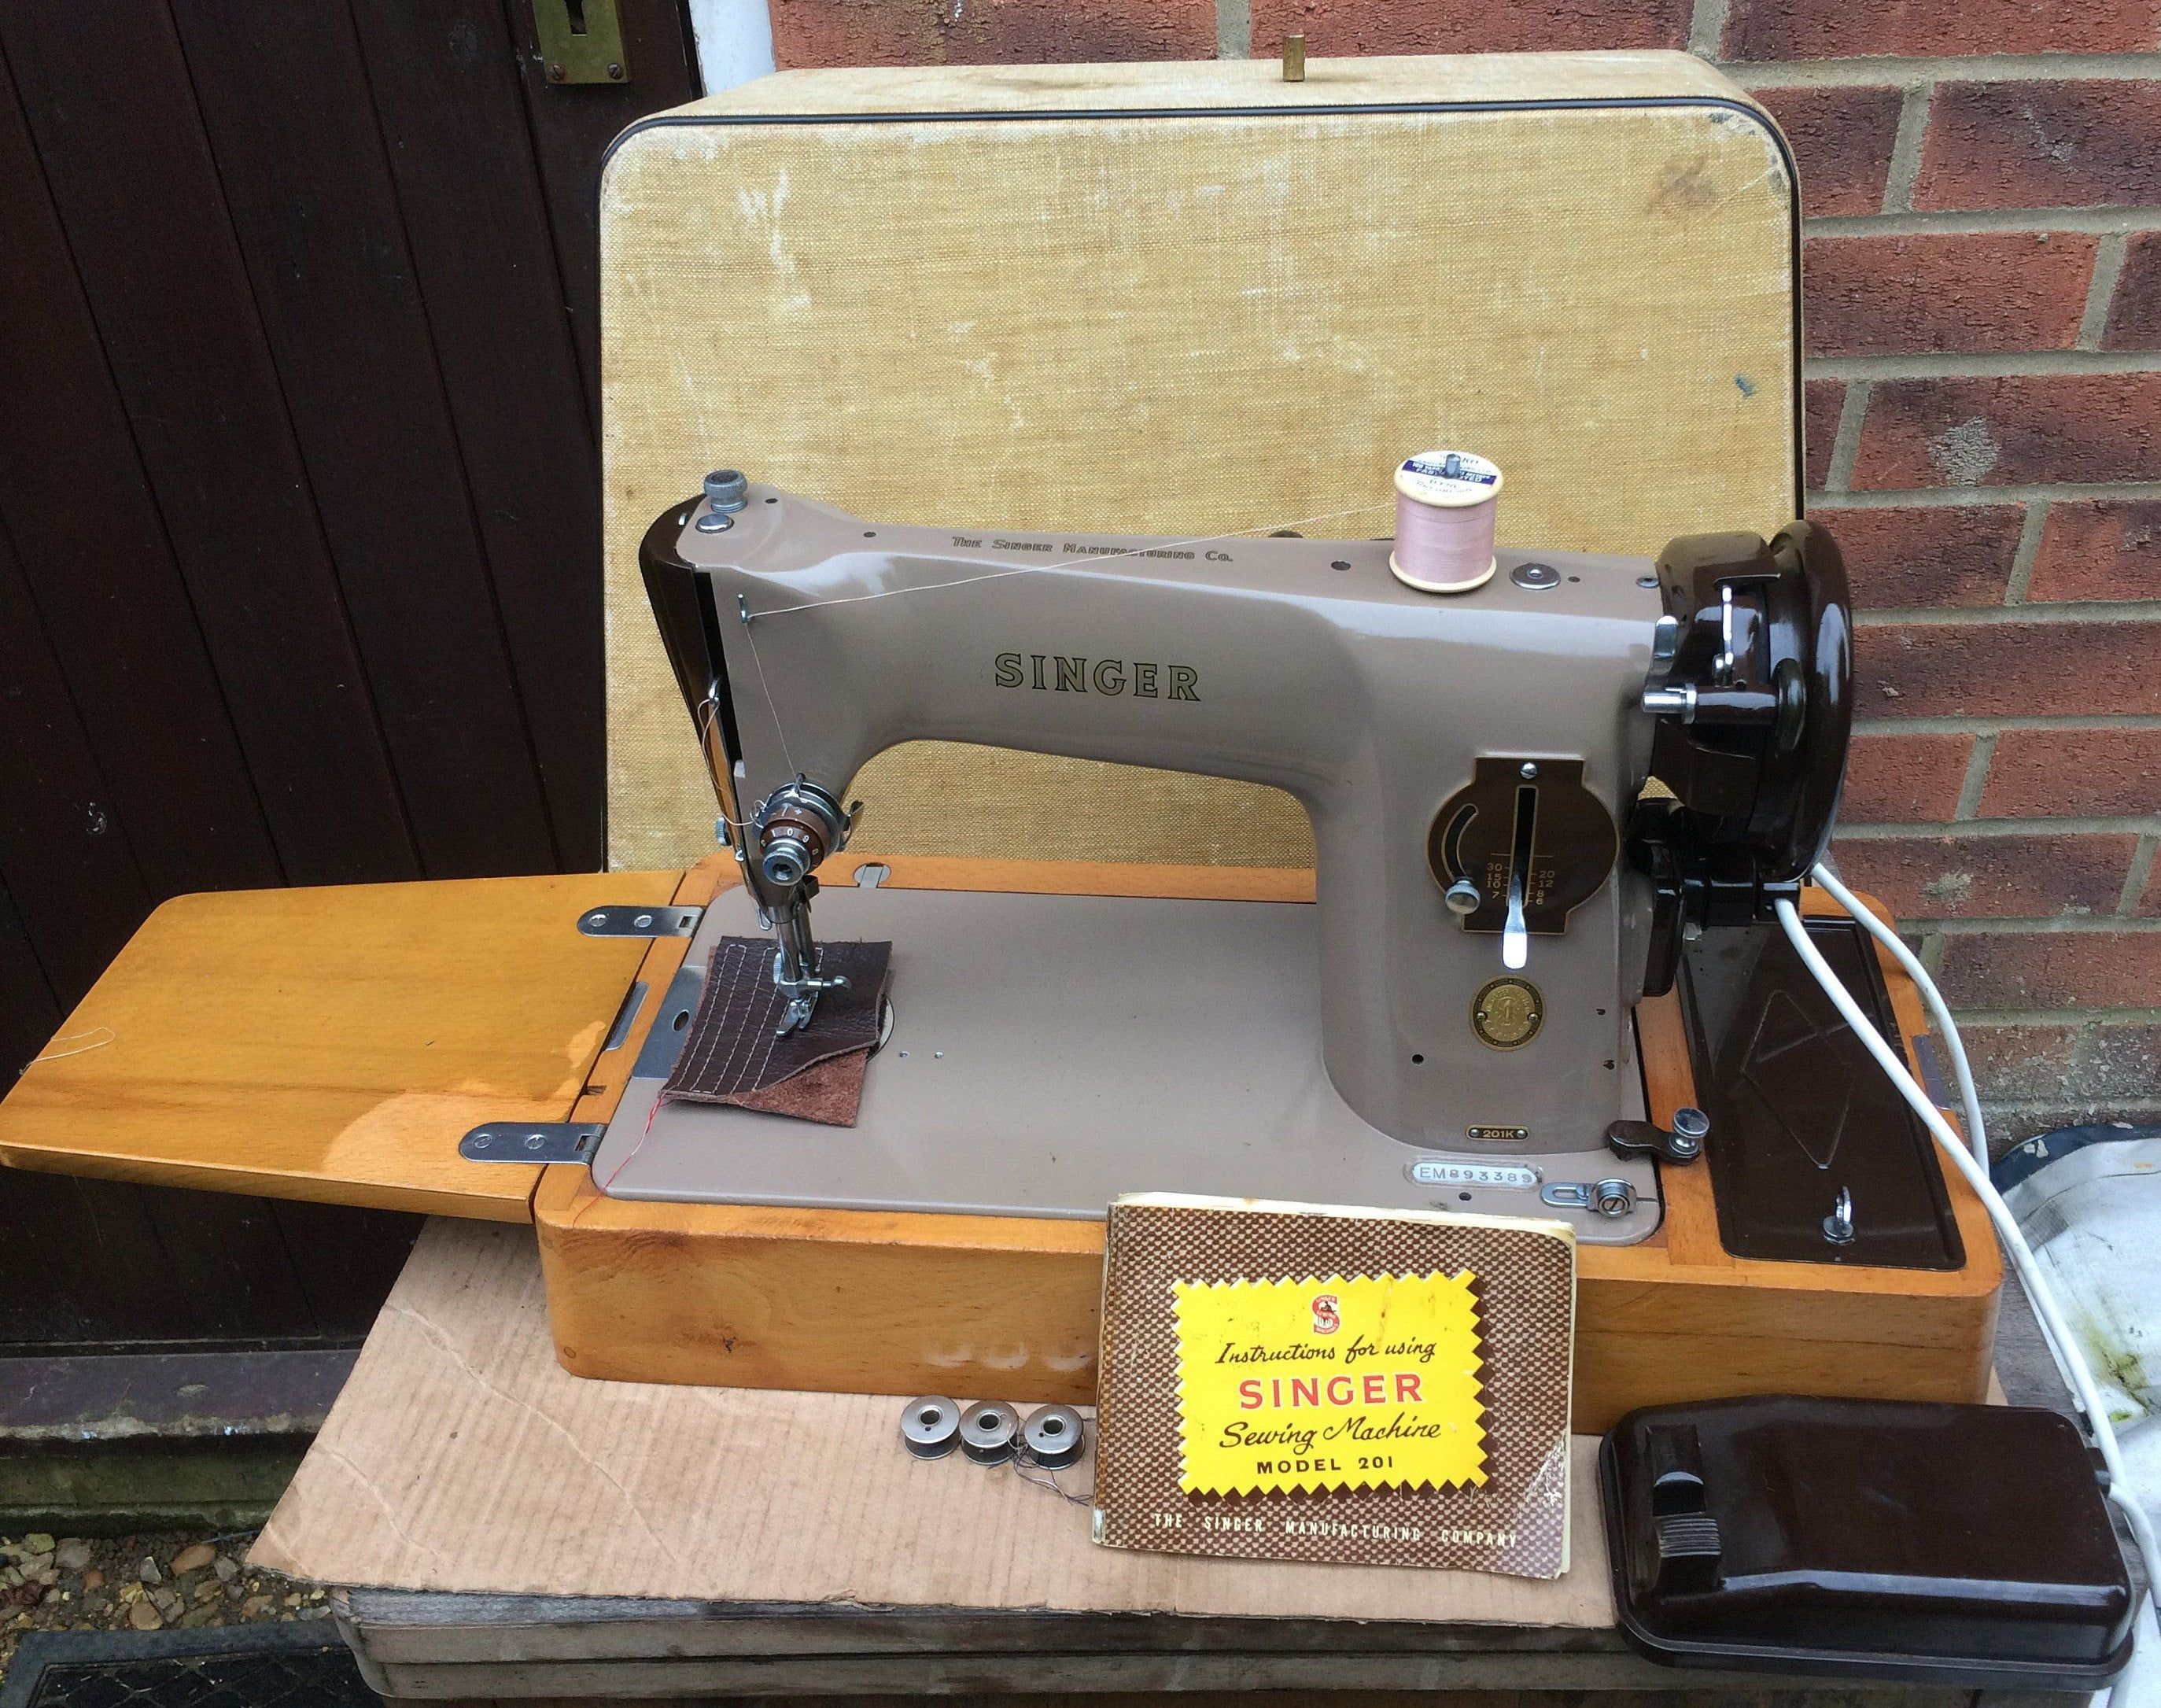 1957 Vintage Singer 201k Aluminiun Electric Semi Industrial Sewing Machine Antique Singer Sewing Machine Vintage Home Decor Art Gallery Singer Sewing Machine Vintage Antique Sewing Machines Vintage Sewing Machines